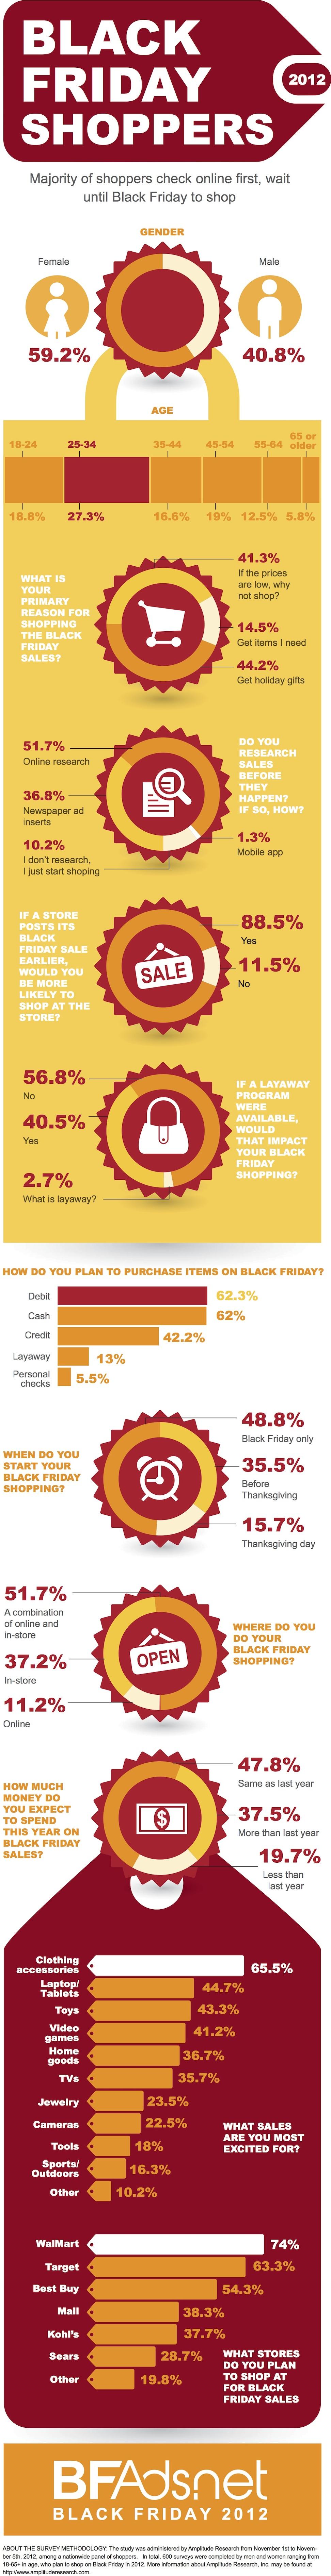 Black_Friday_Infographic-1